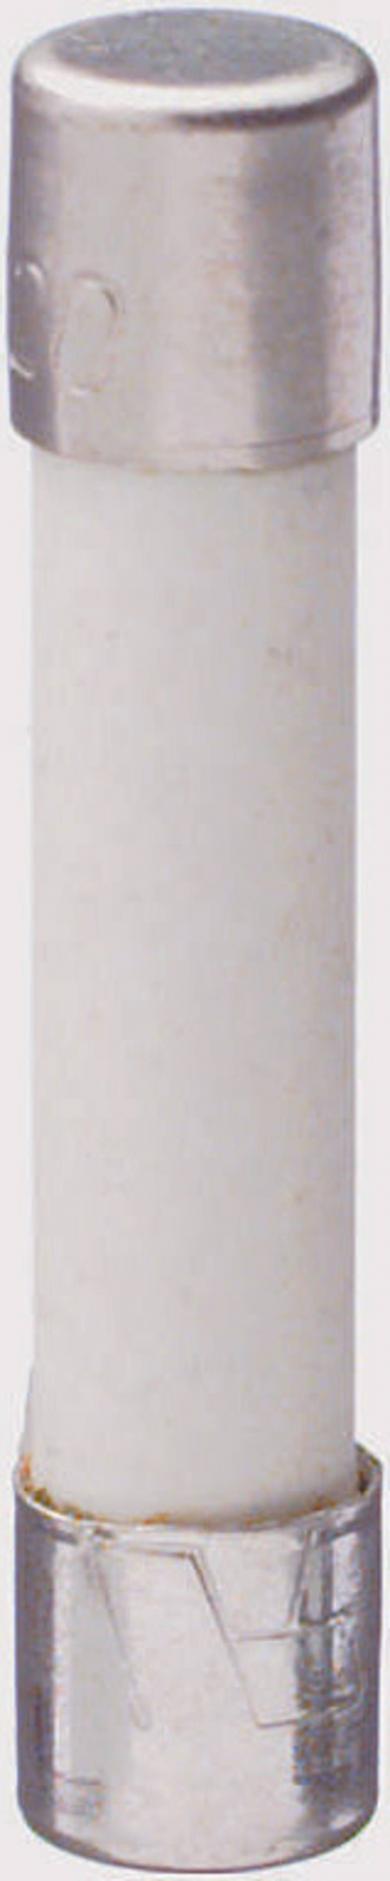 Siguranţă 6,4 x 31,8 mm ultrarapidă -FF- Eska tip GBB, 250 V/AC, 125 V/DC, 1 A